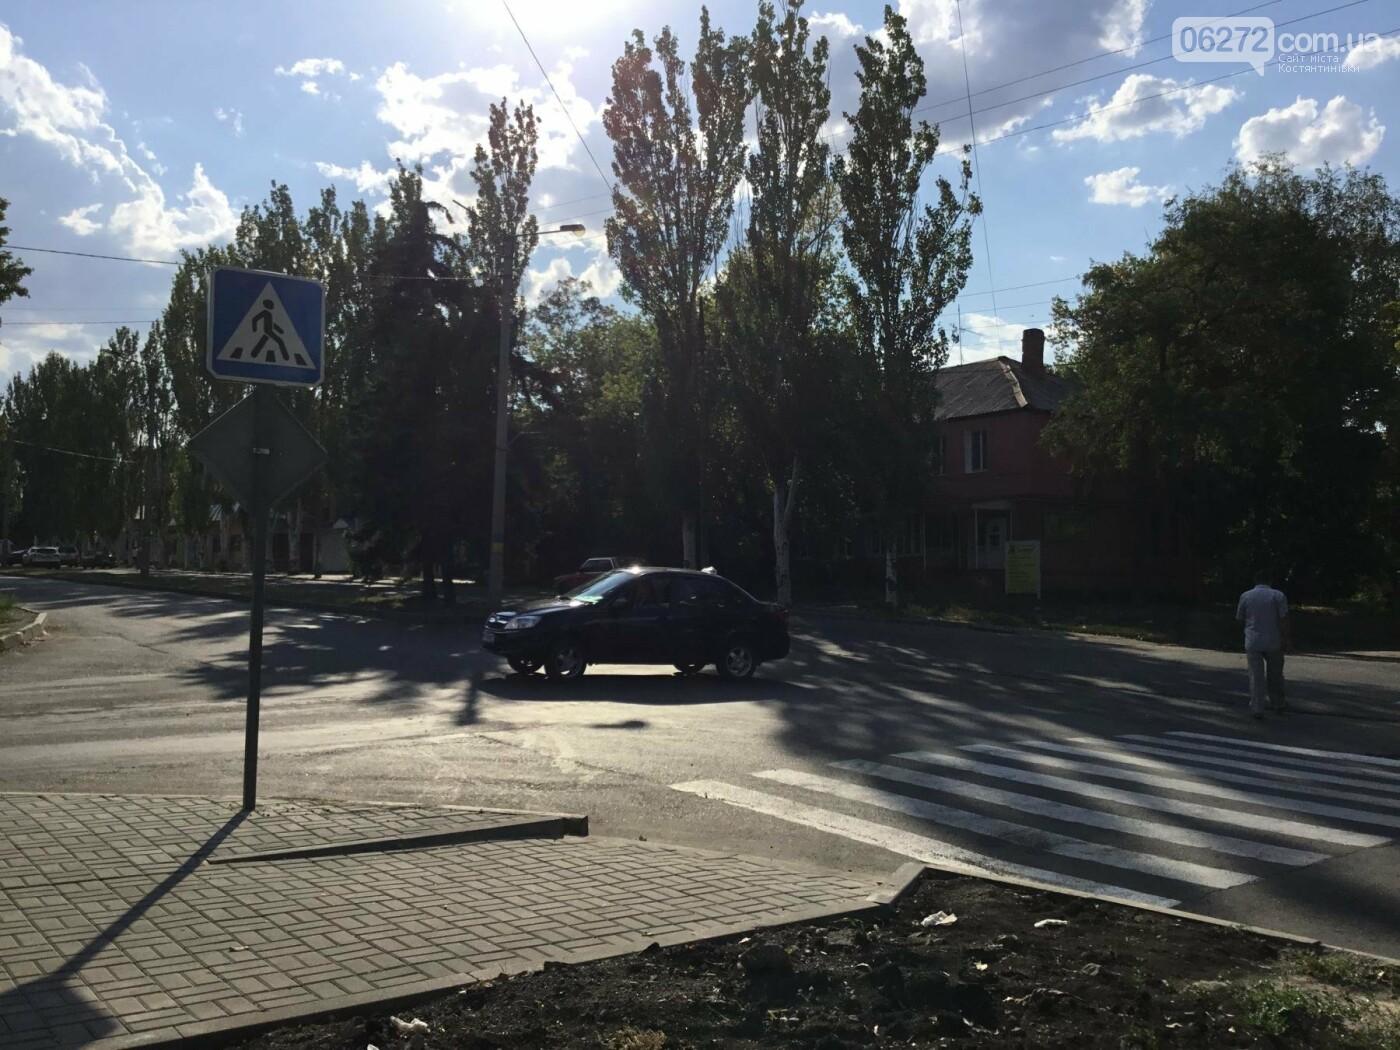 Дорога после ремонта по ул. Леваневского в Константиновке, фото-7